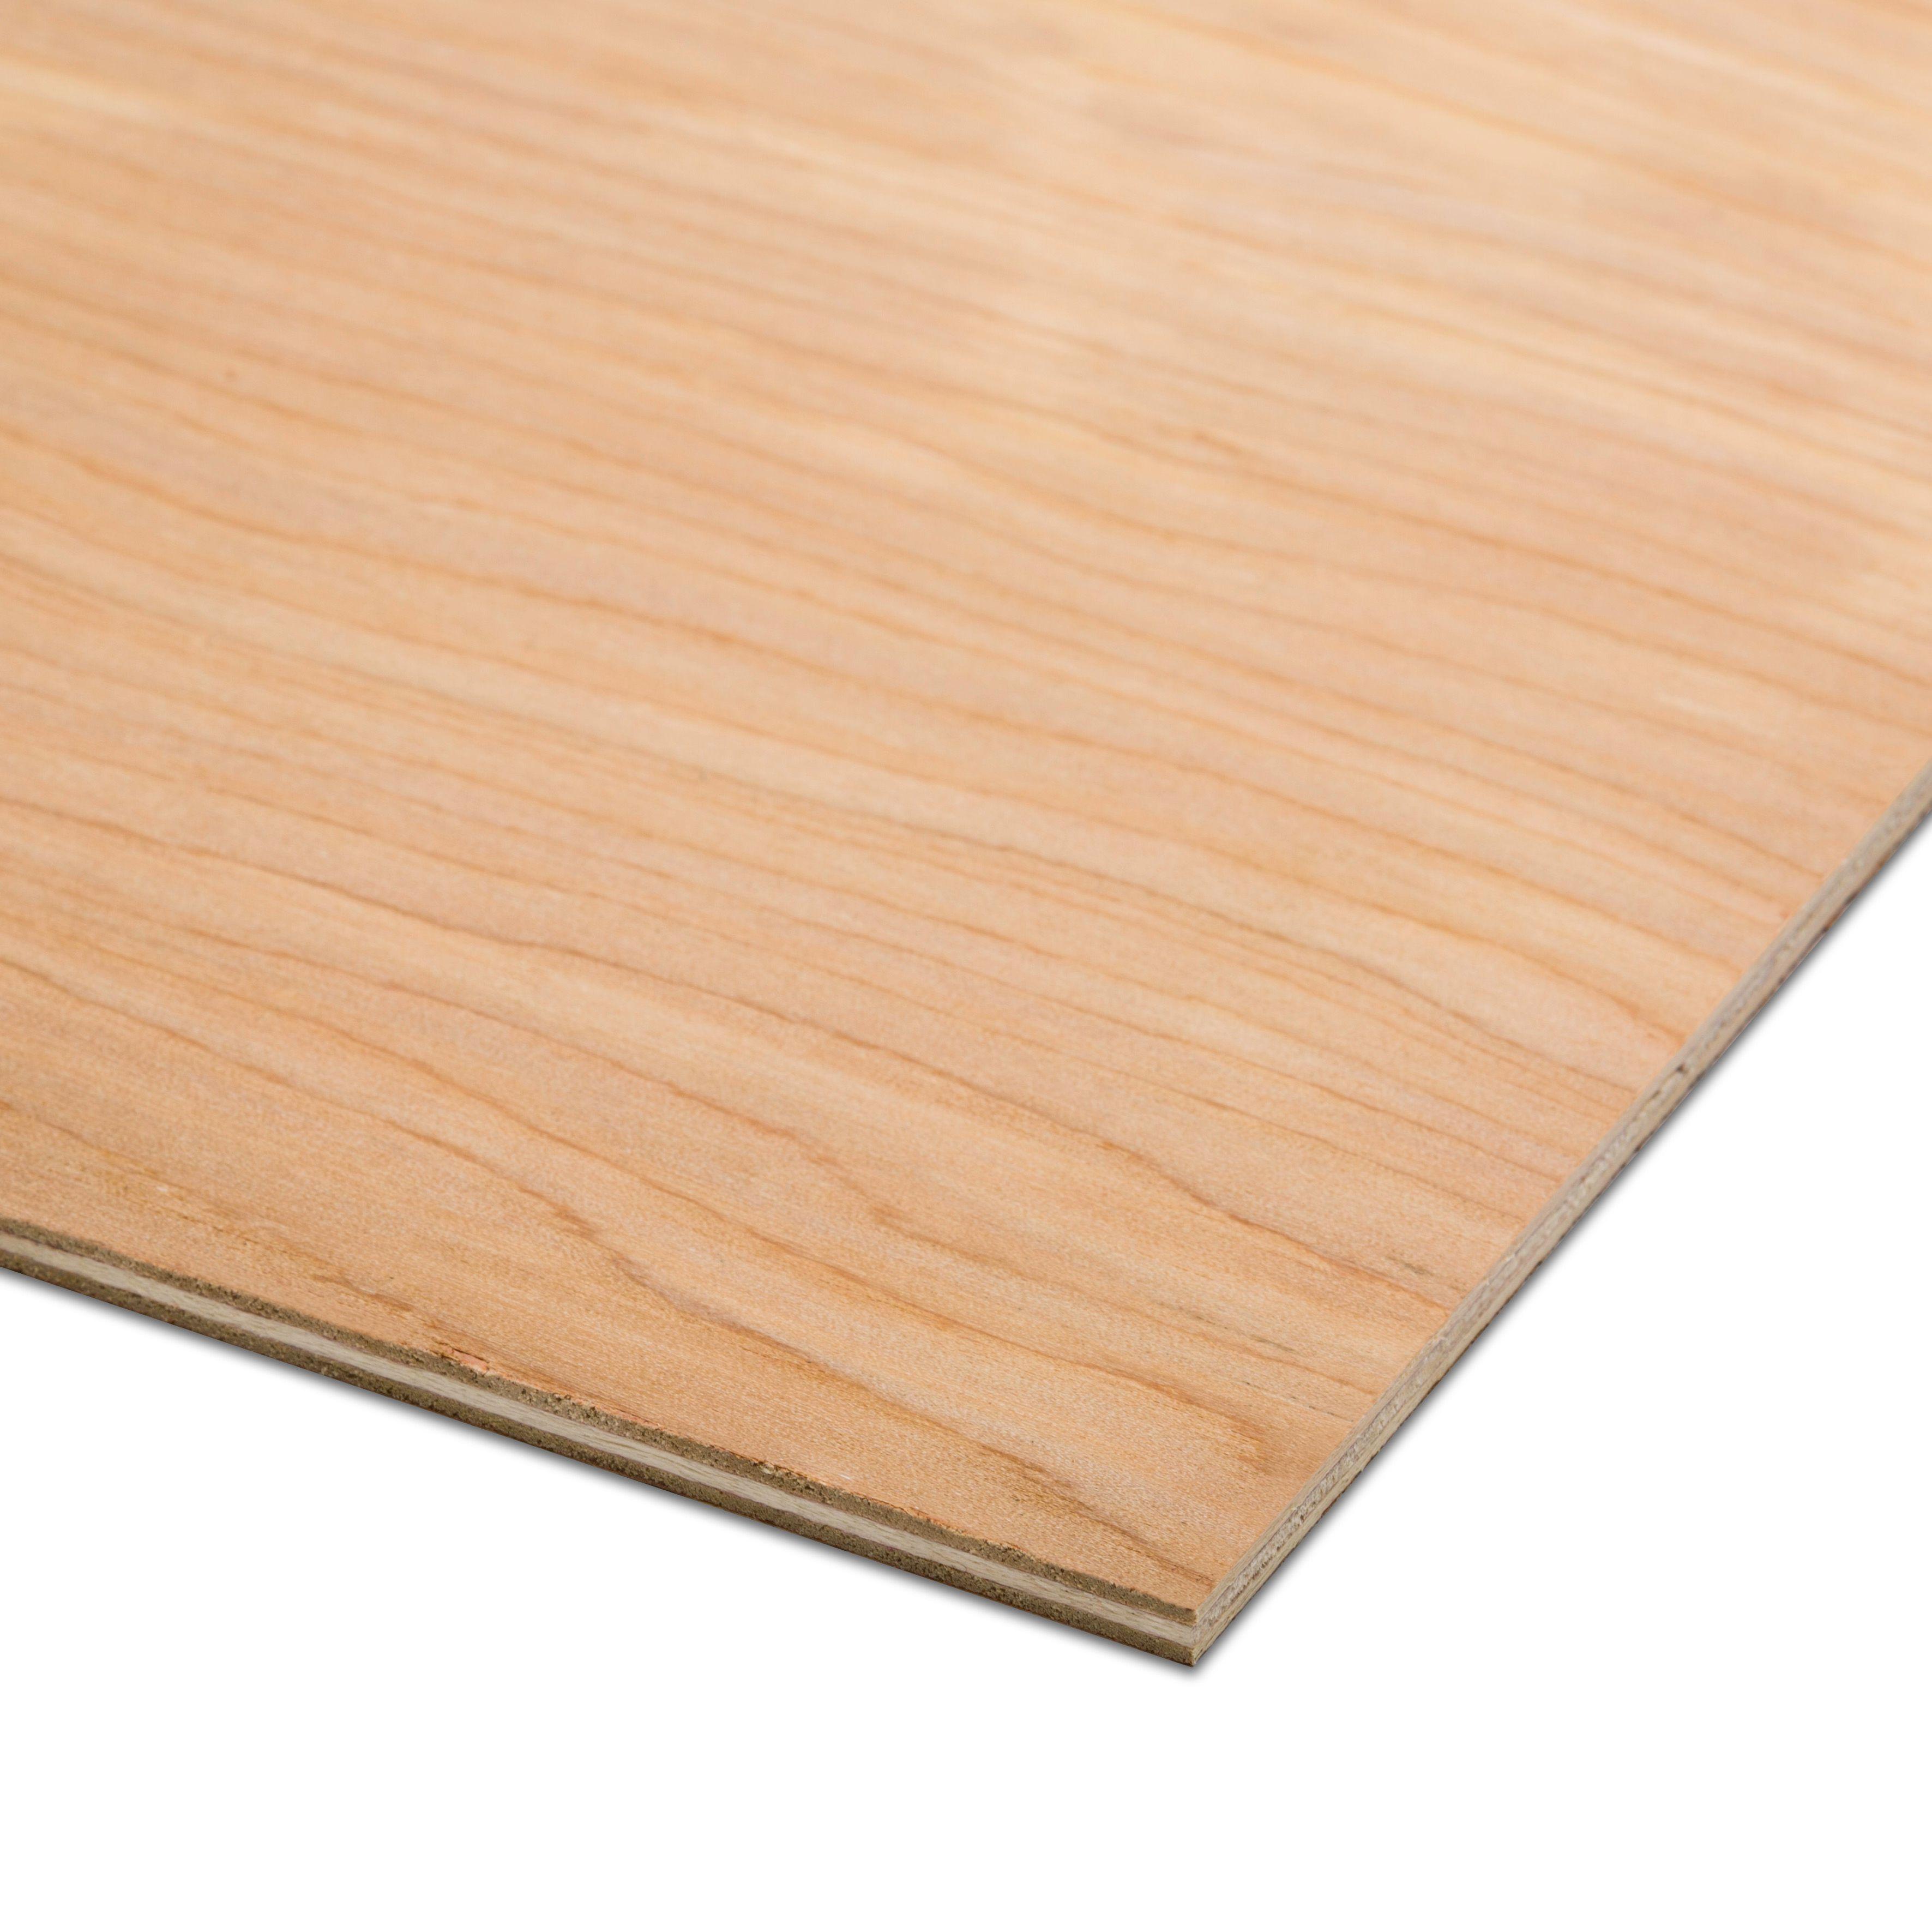 Hardwood Plywood Th 5 5mm W 1220mm L 2440mm Departments Diy At B Q